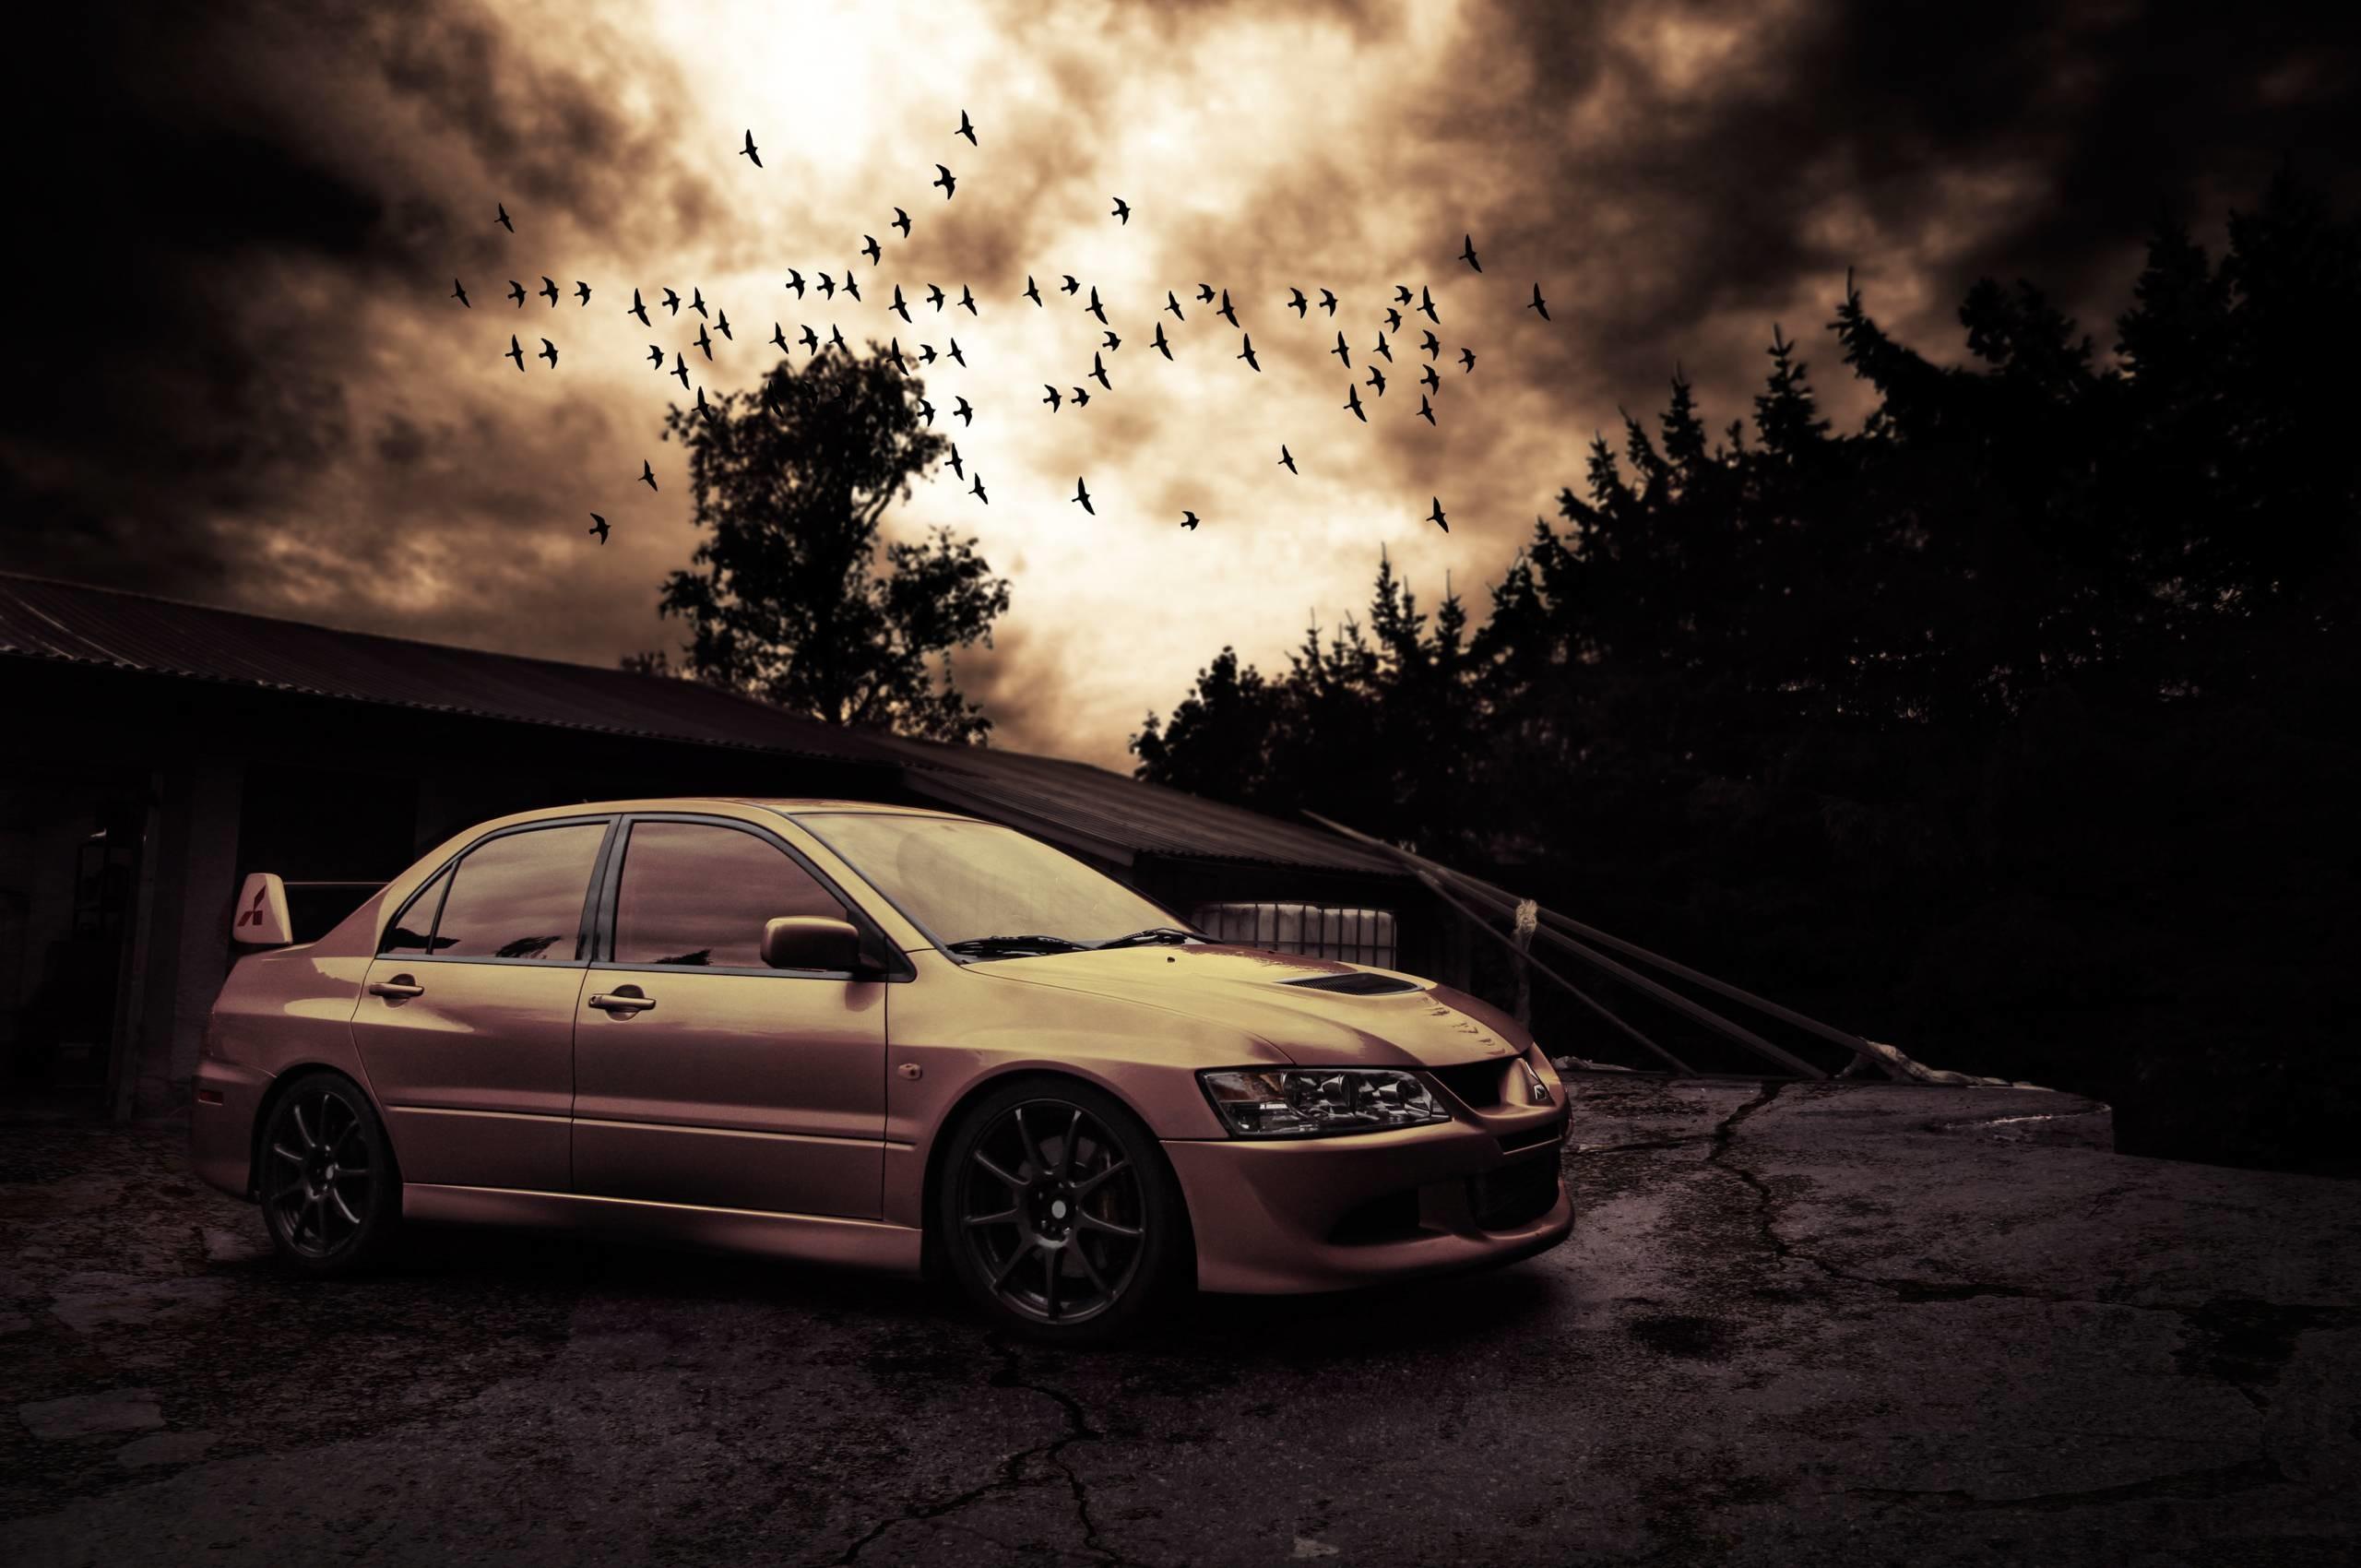 2560x1700 Mitsubishi Lancer Evo Viii D N D N N Wallpapers : Hd Car  Wallpapers · Download · Standard .